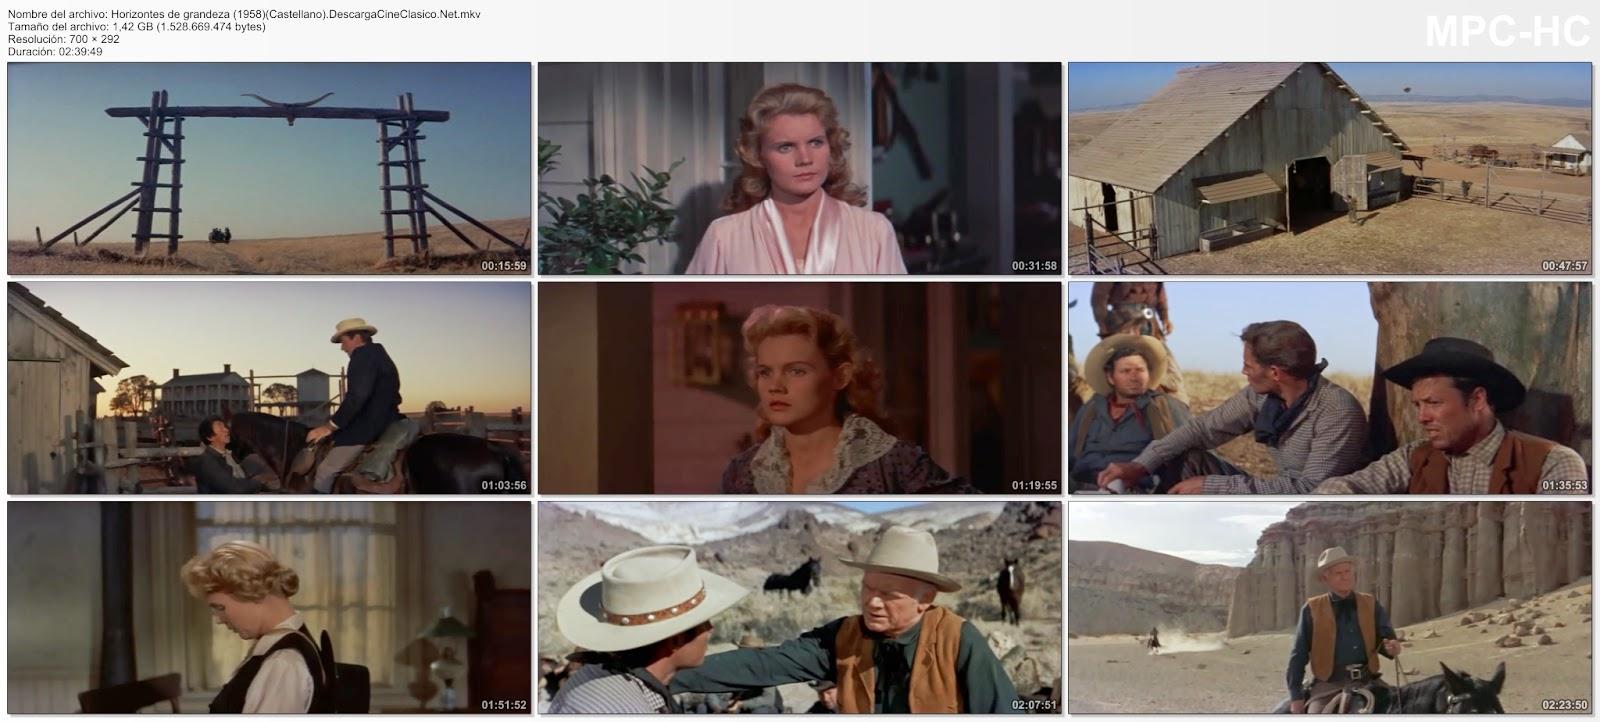 Horizontes de grandeza (1958 - The Big Country)